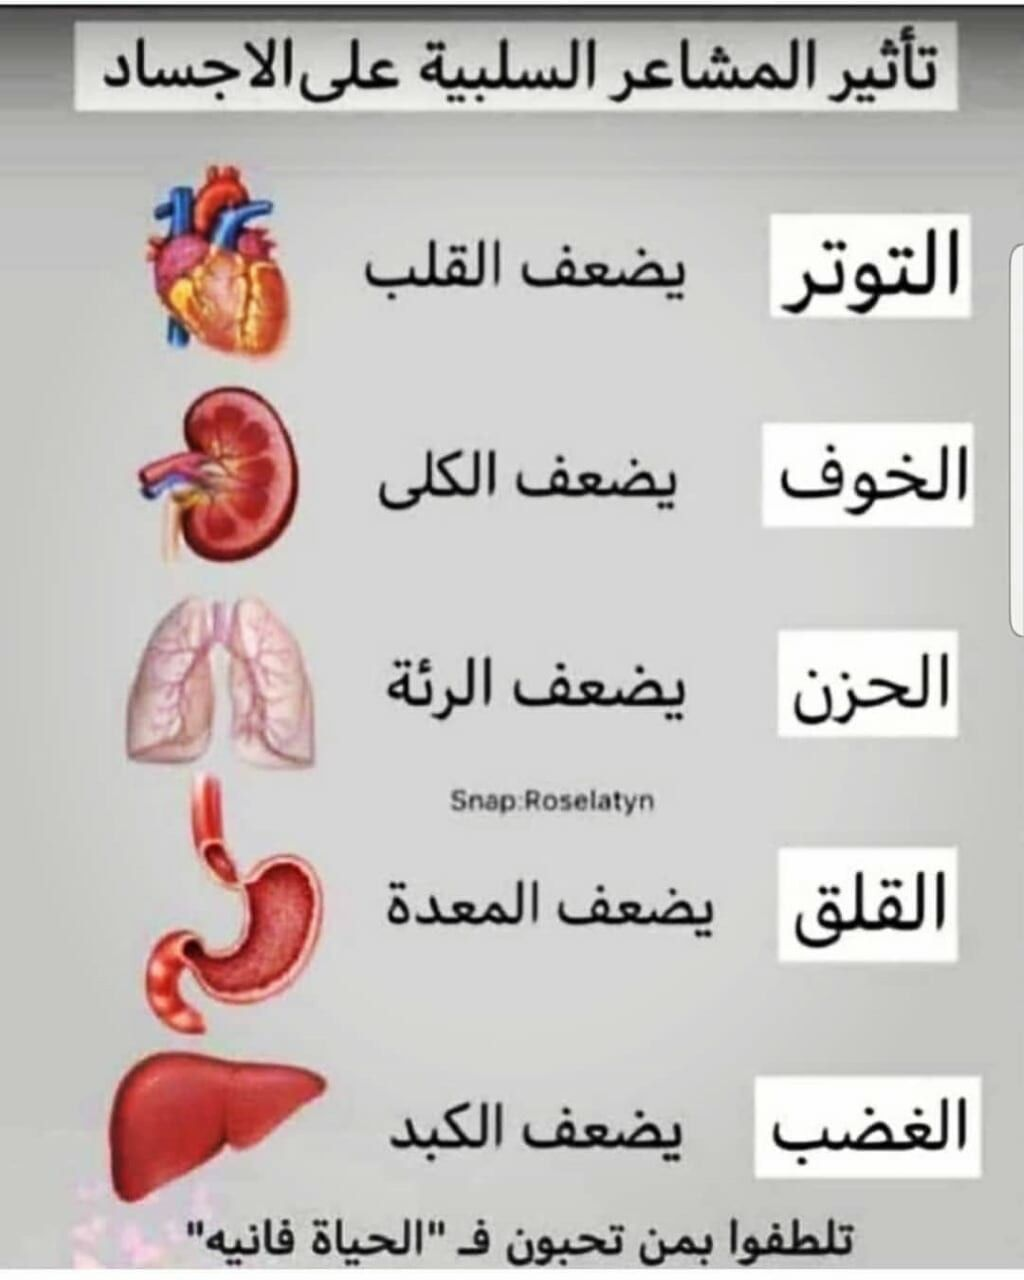 Pin By Naminas On نصايح Positive Notes Health Check Health Advice